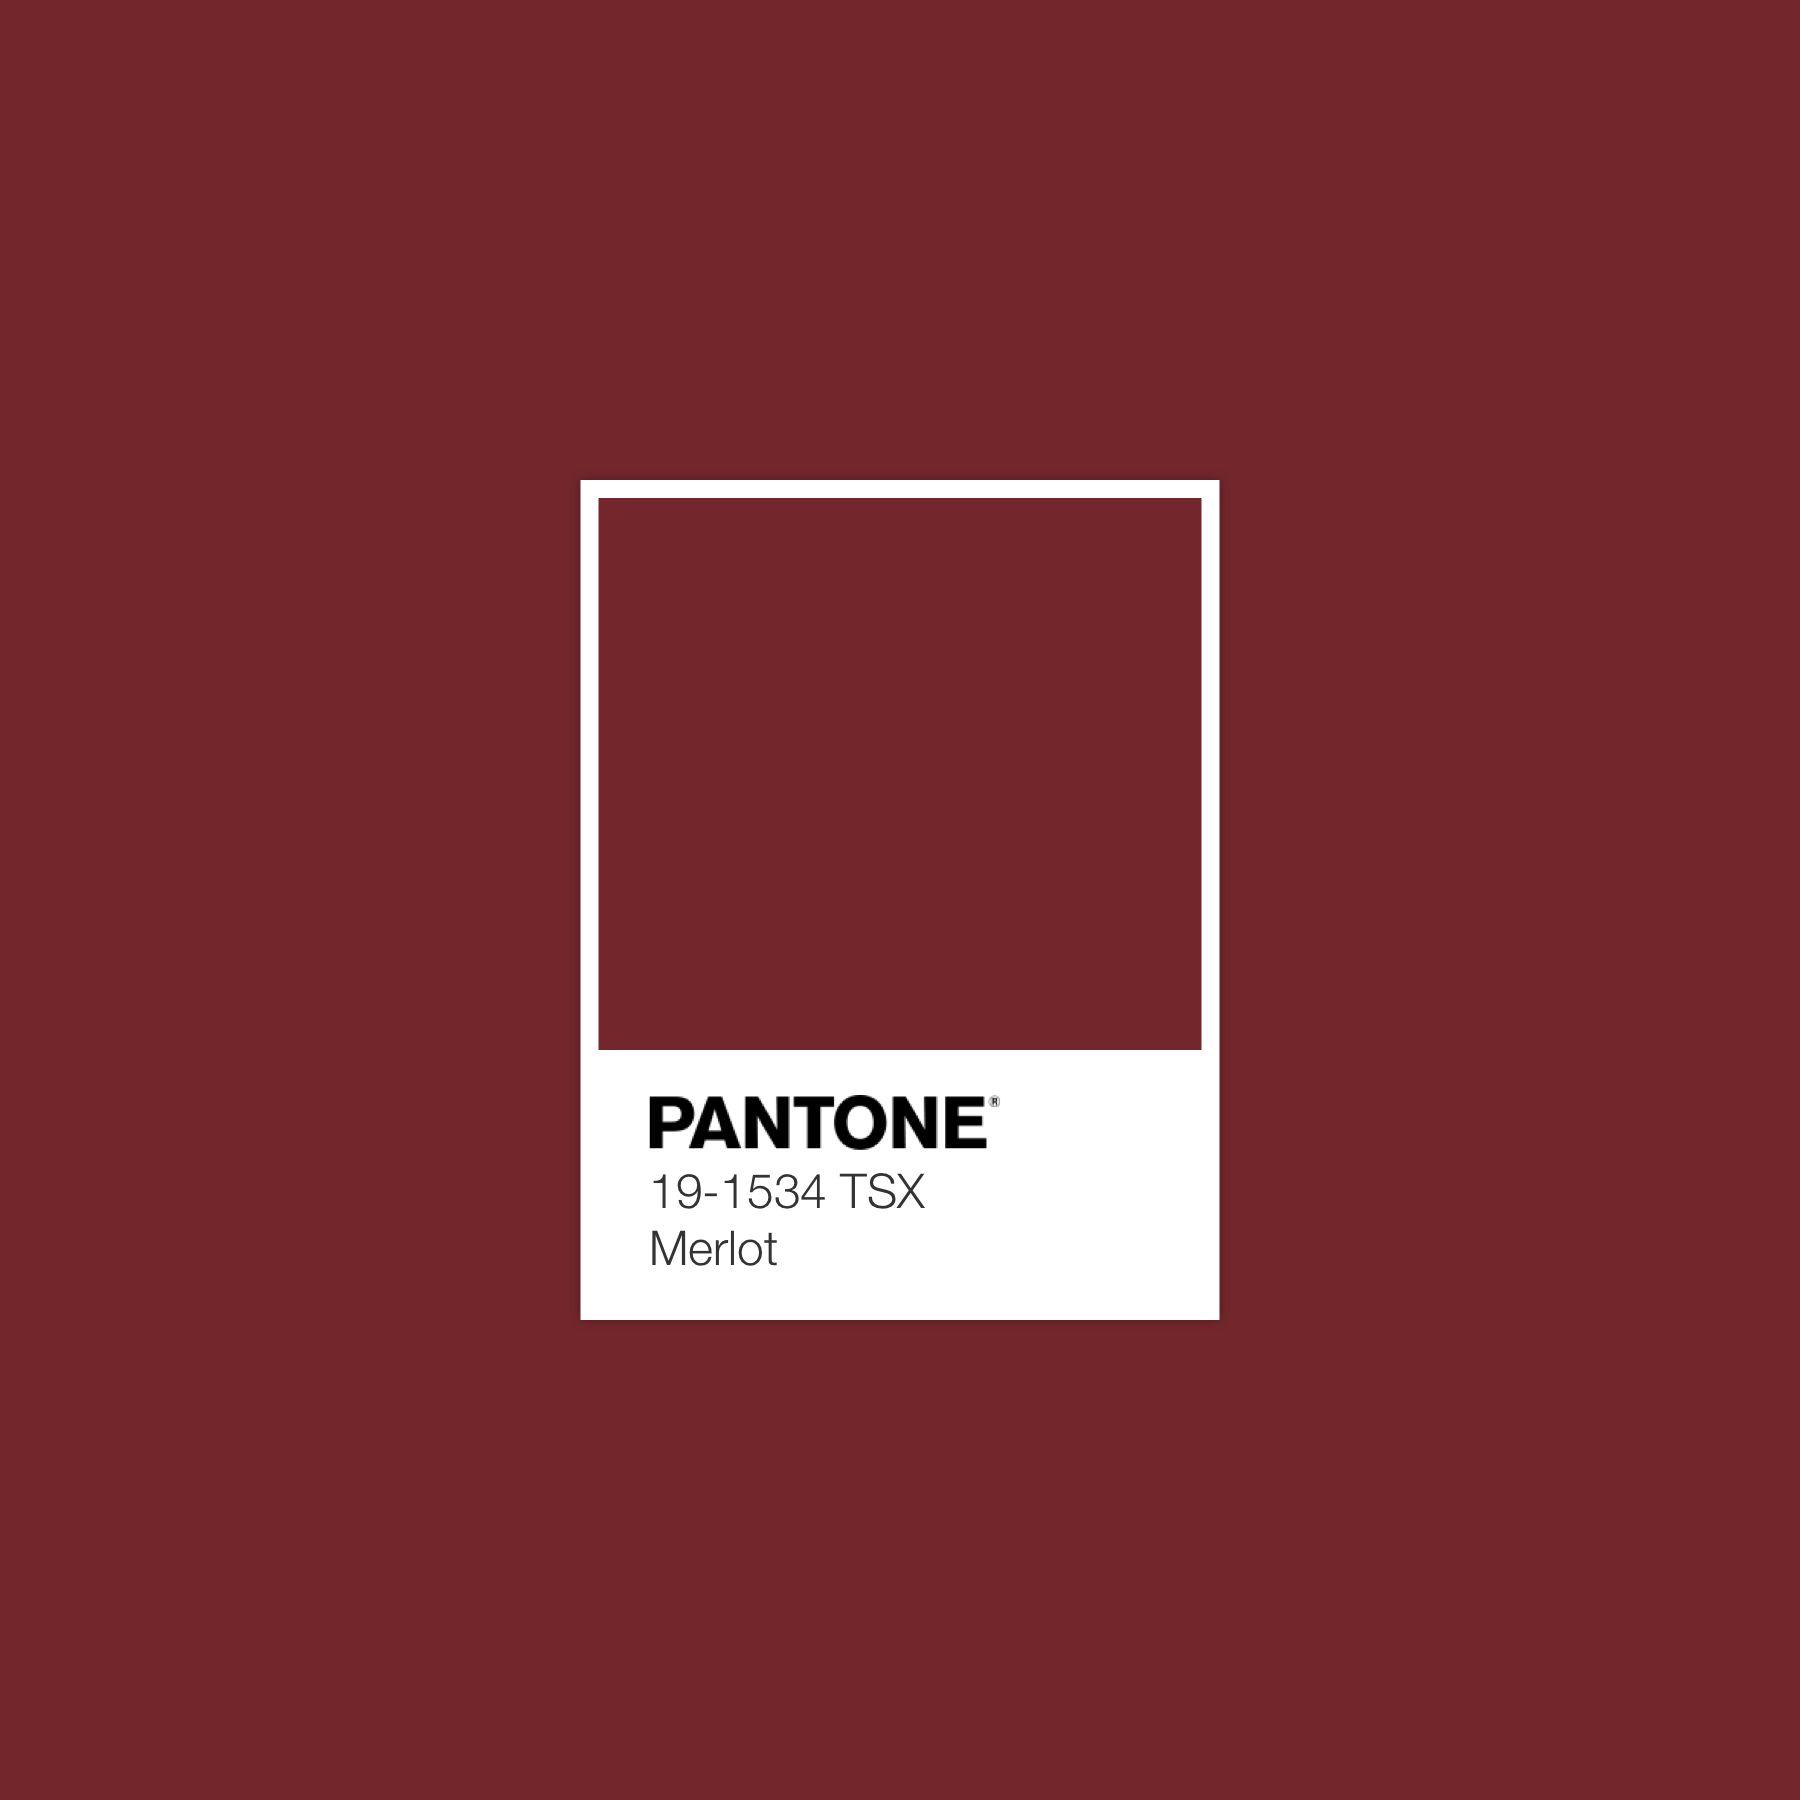 Merlot Pantone Luxurydotcom Pantone Colour Palettes Pantone Palette Pantone Red